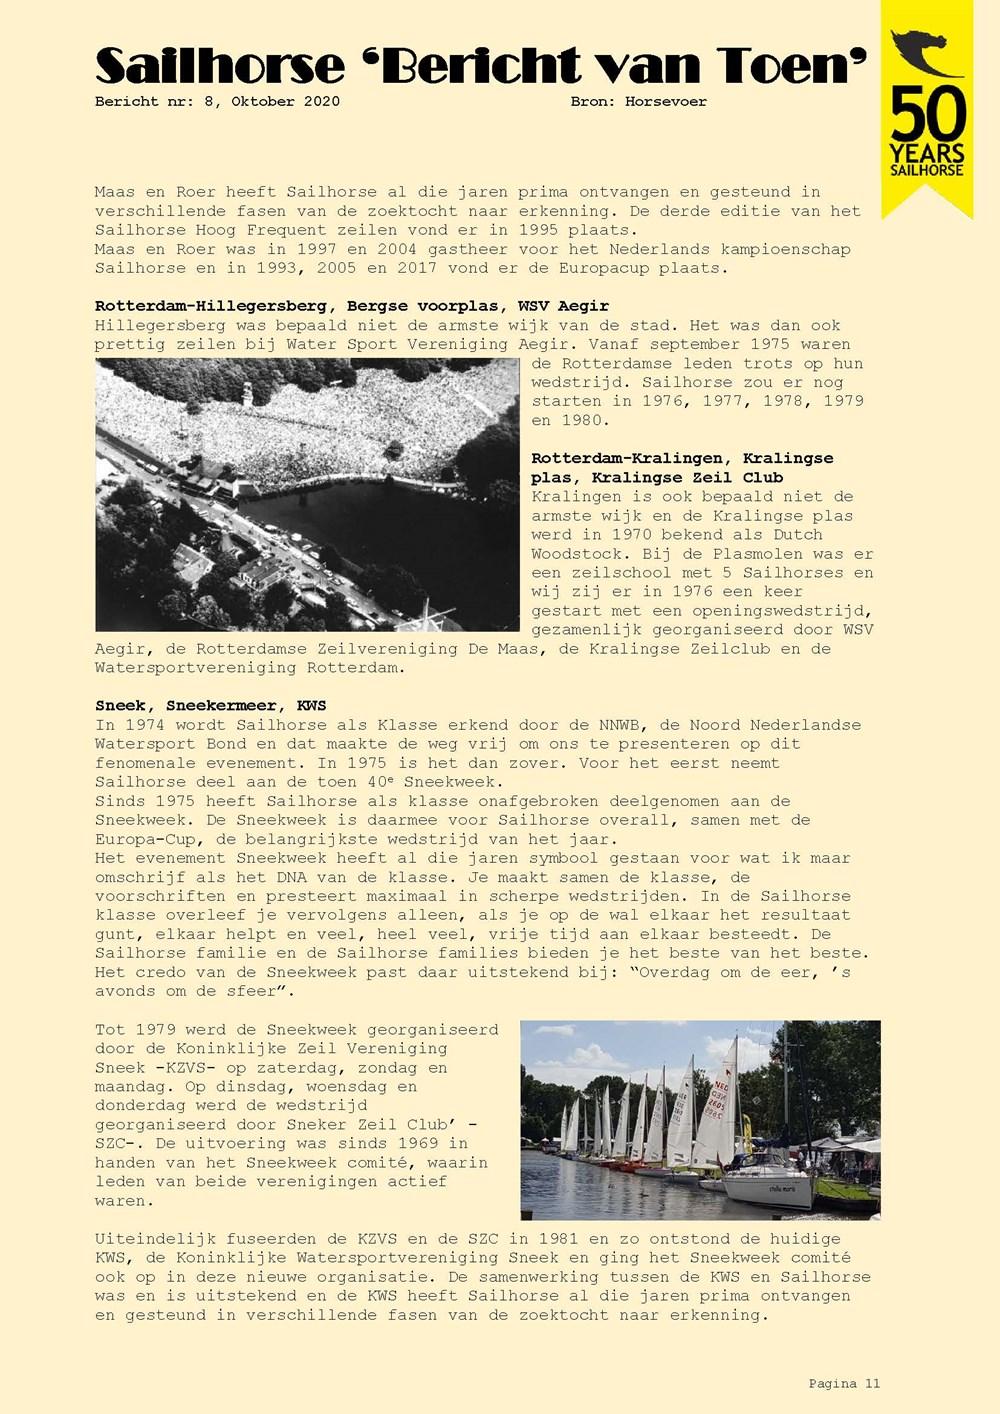 BvT8_Page_11.jpg